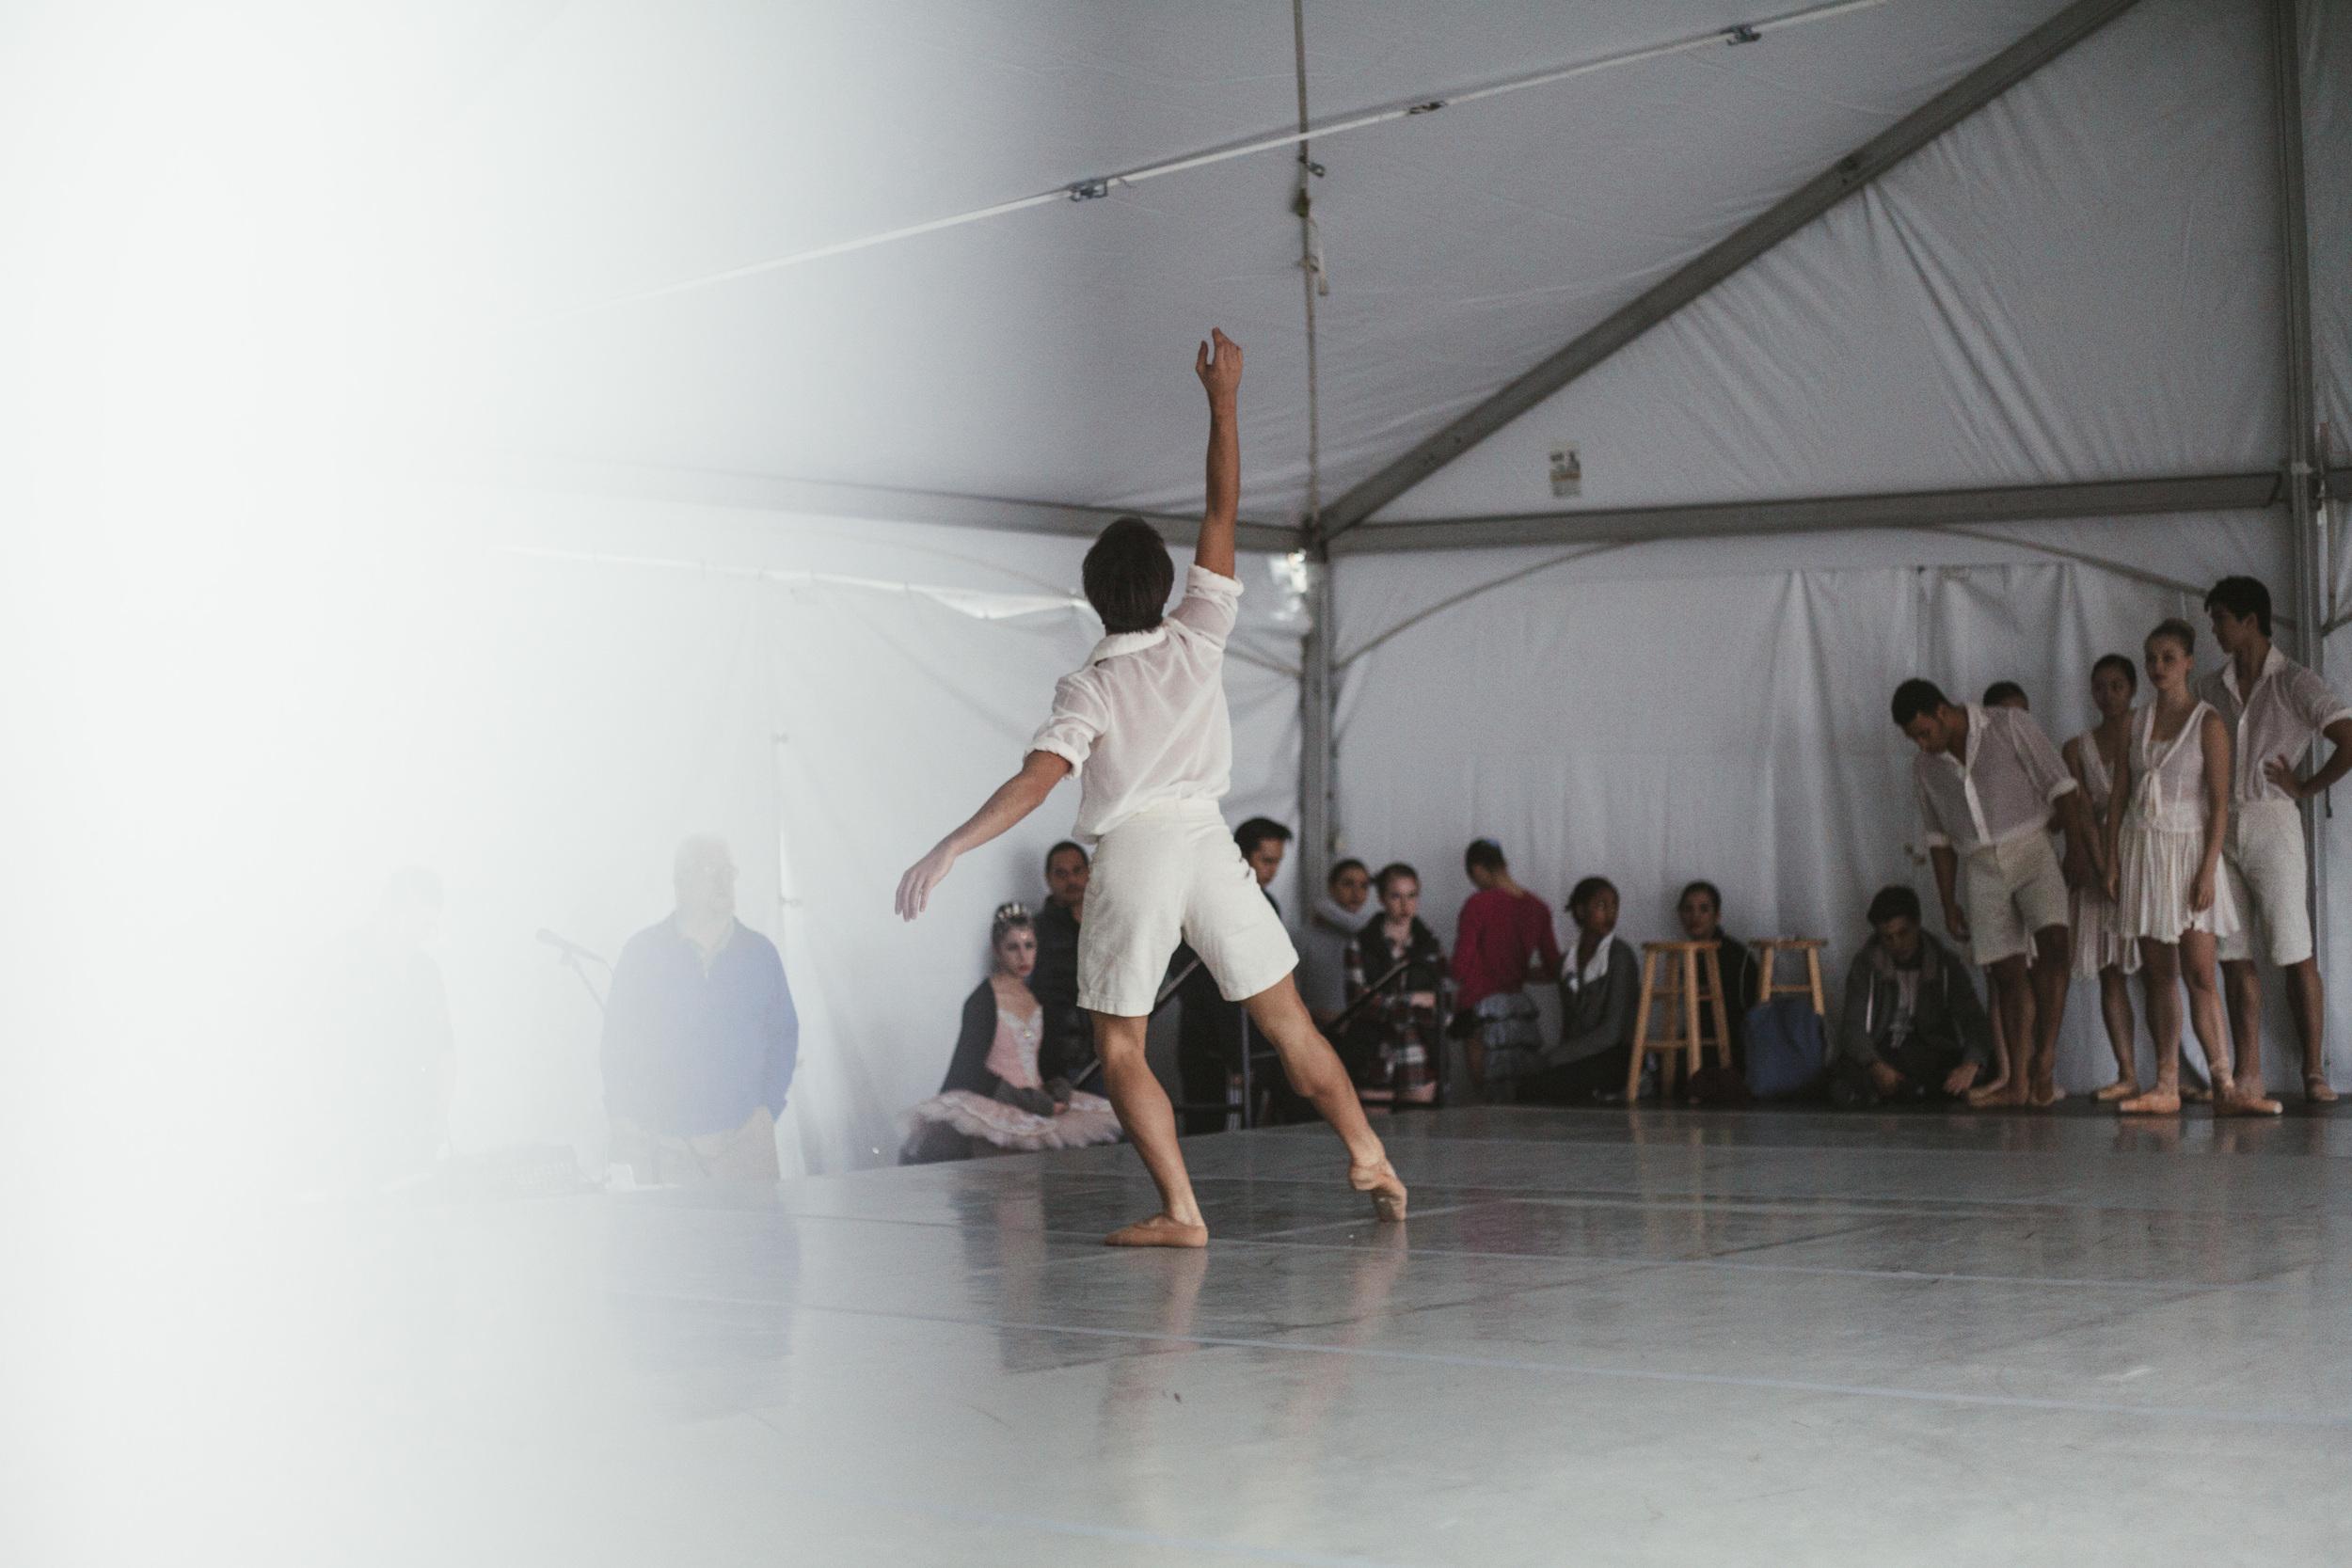 Bozzuto Fall Festival - Performances-13.JPG